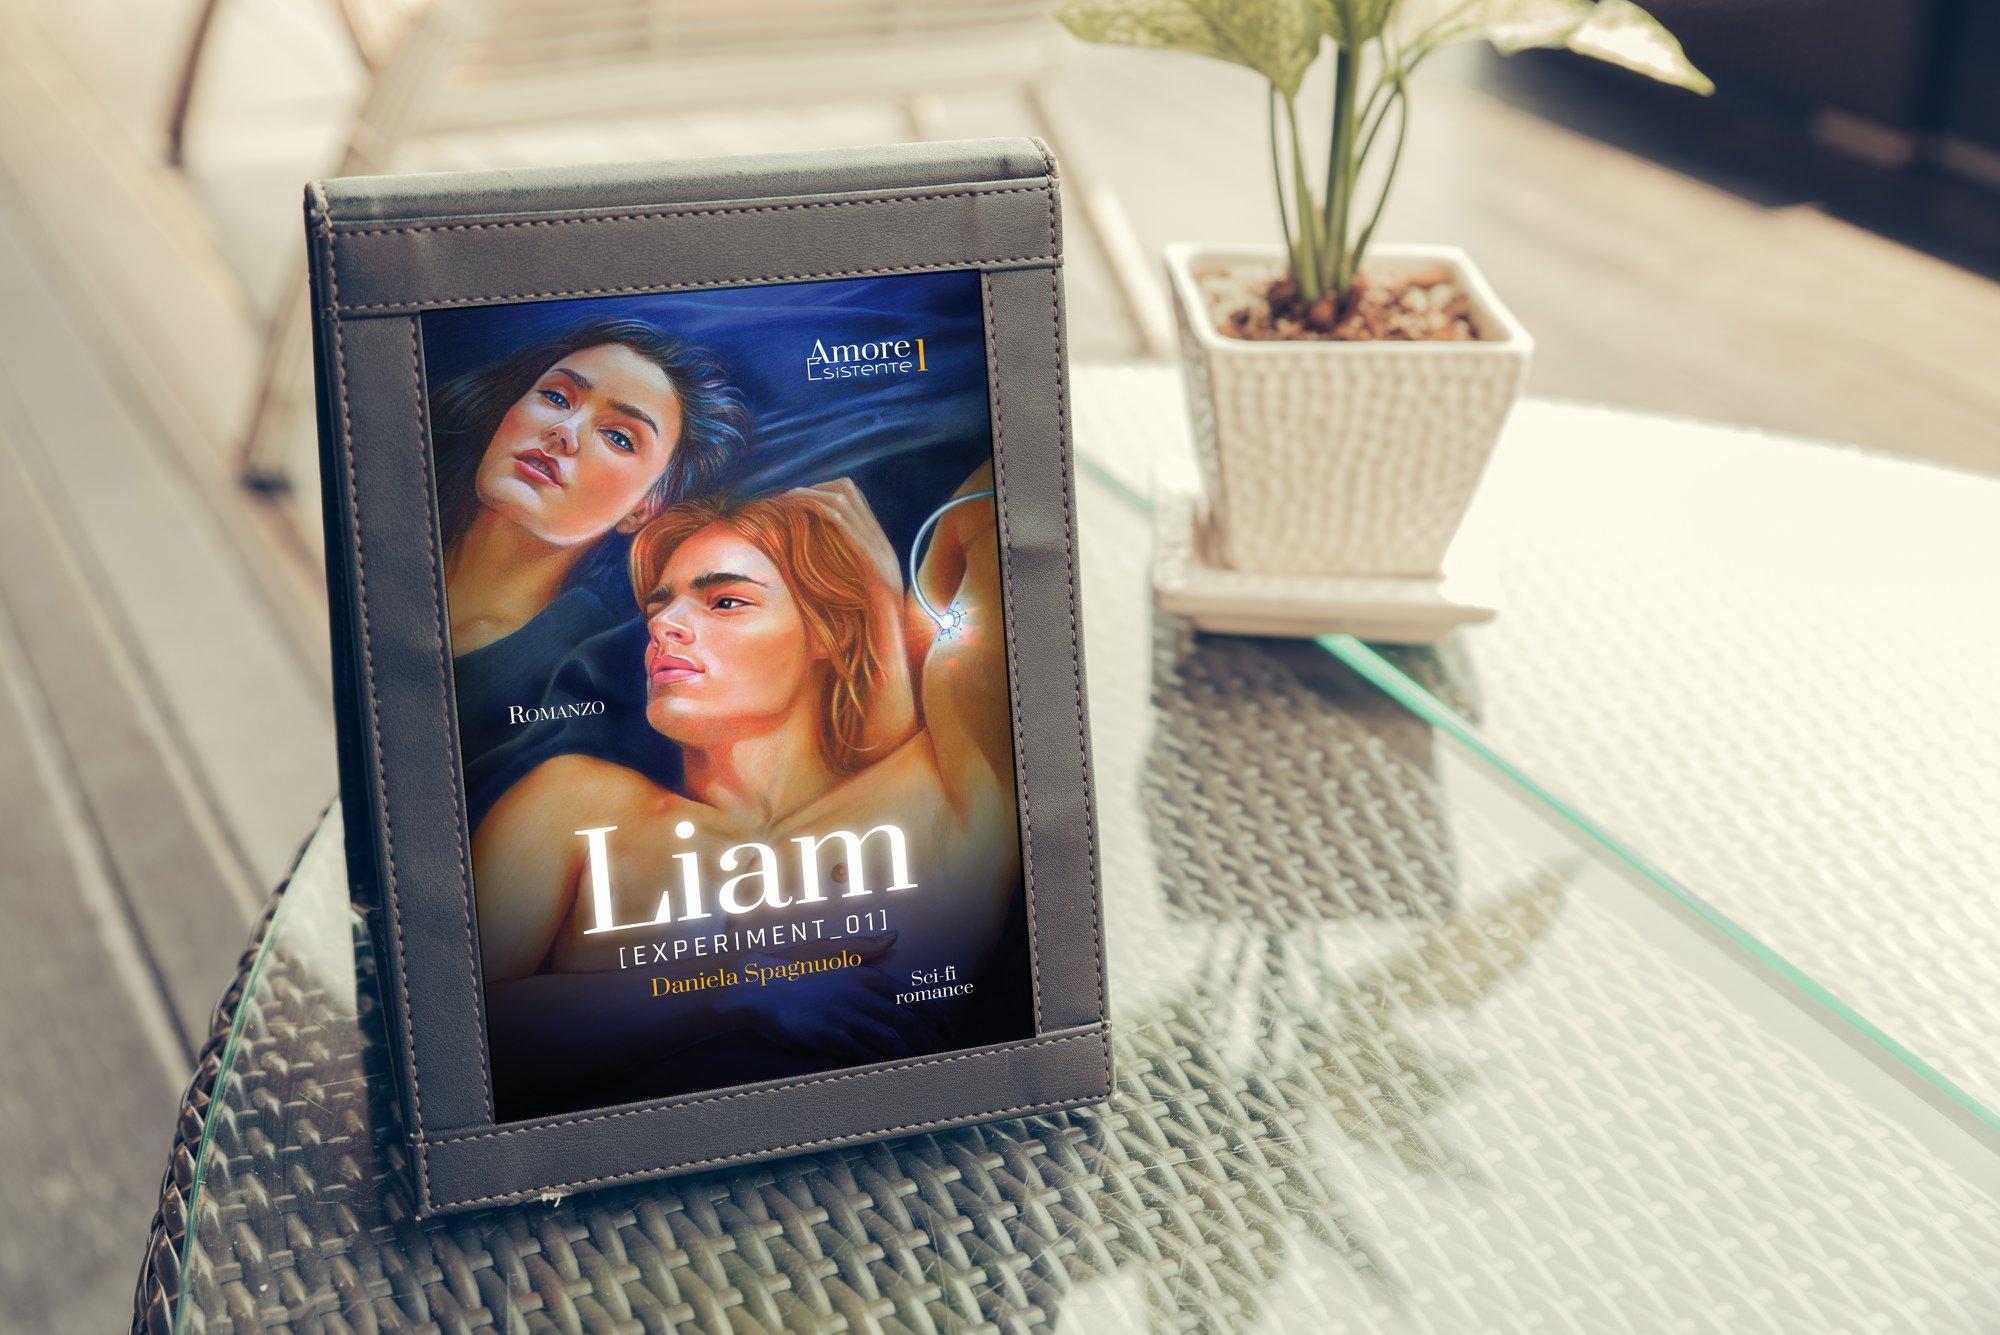 Liam experiment 01 - Cartaceo eBook Kindle Unlimited